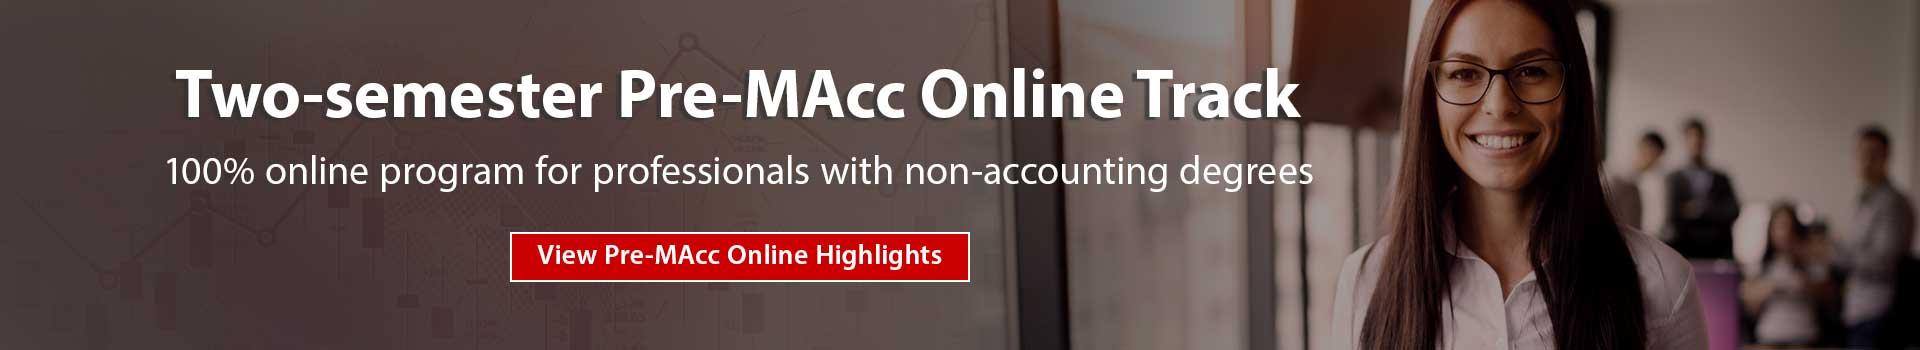 Pre-MAcc Online Track